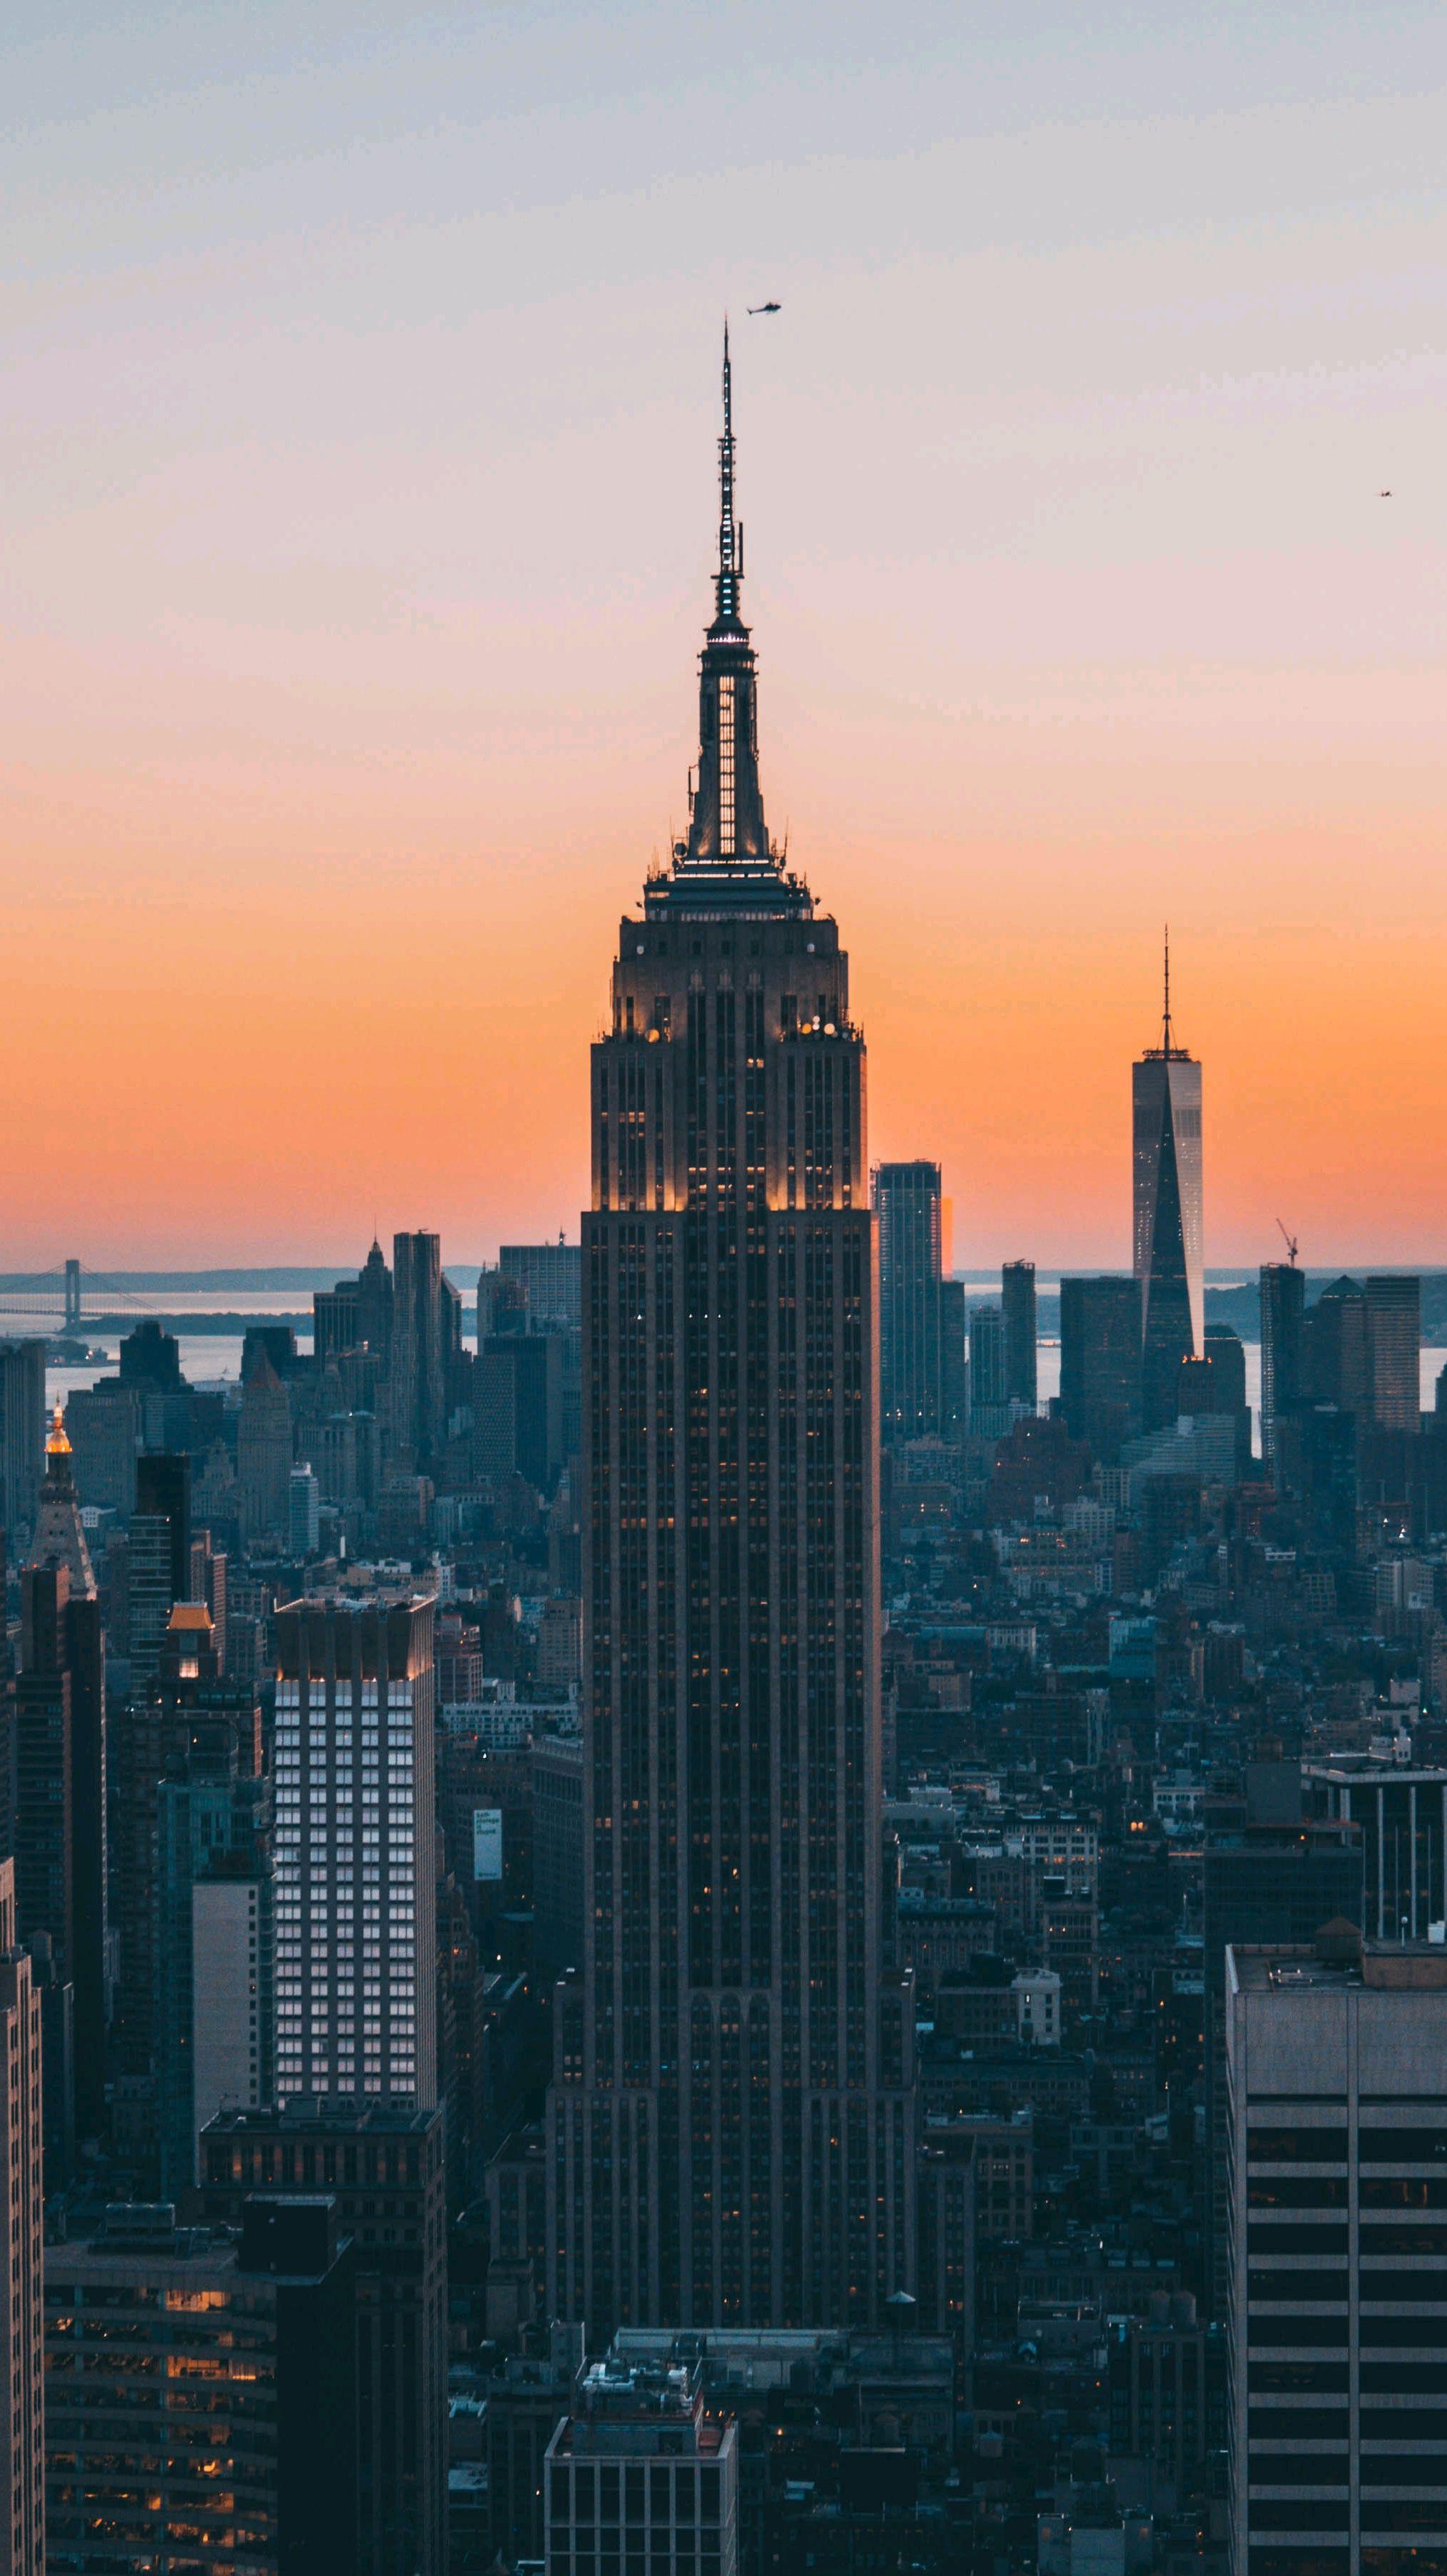 Empire State Building New York Evening iPhone Wallpaper iphoneswallpapers com